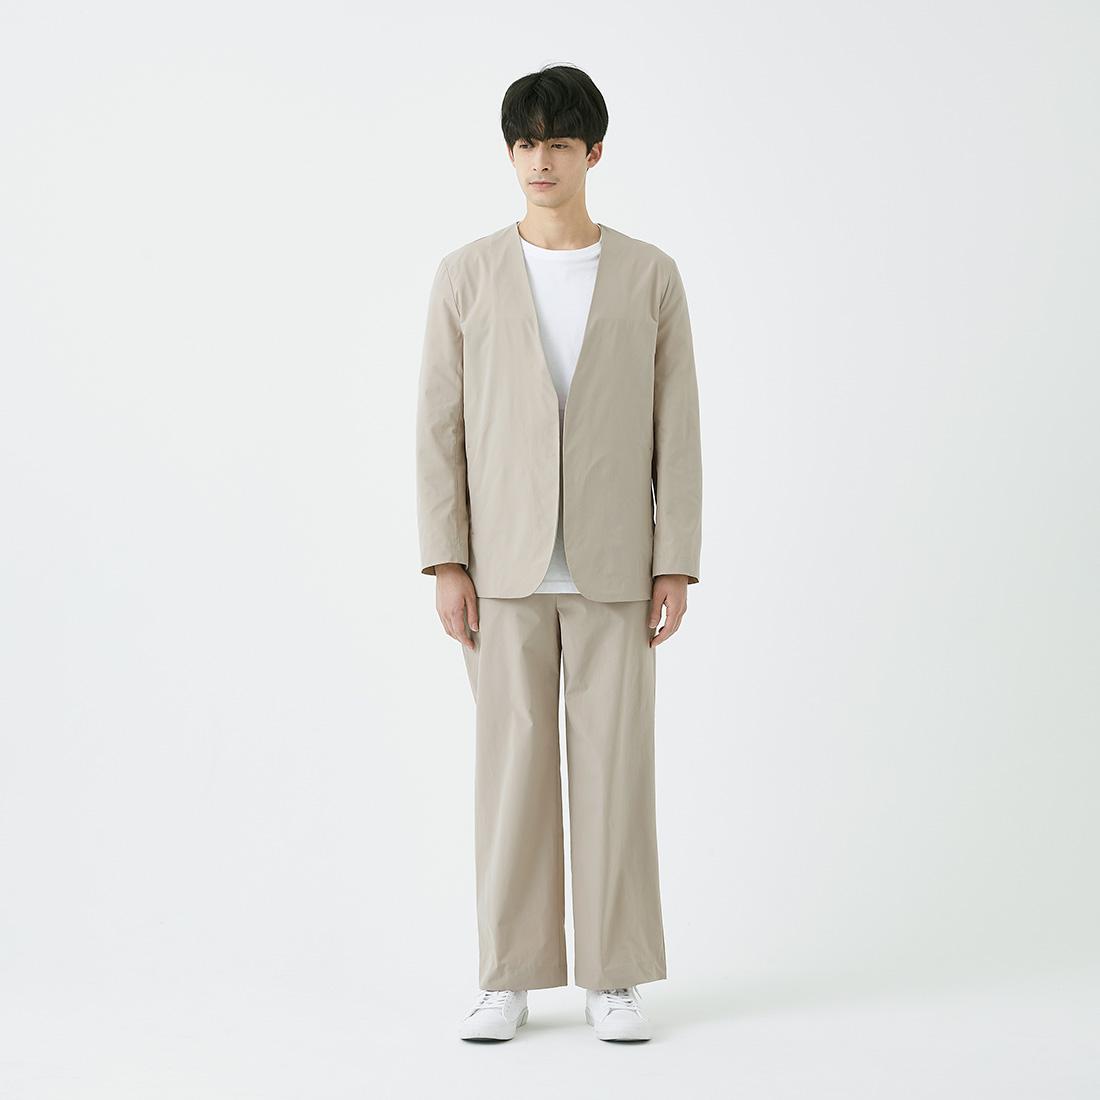 borderless no-collar jacket -male-の商品写真16